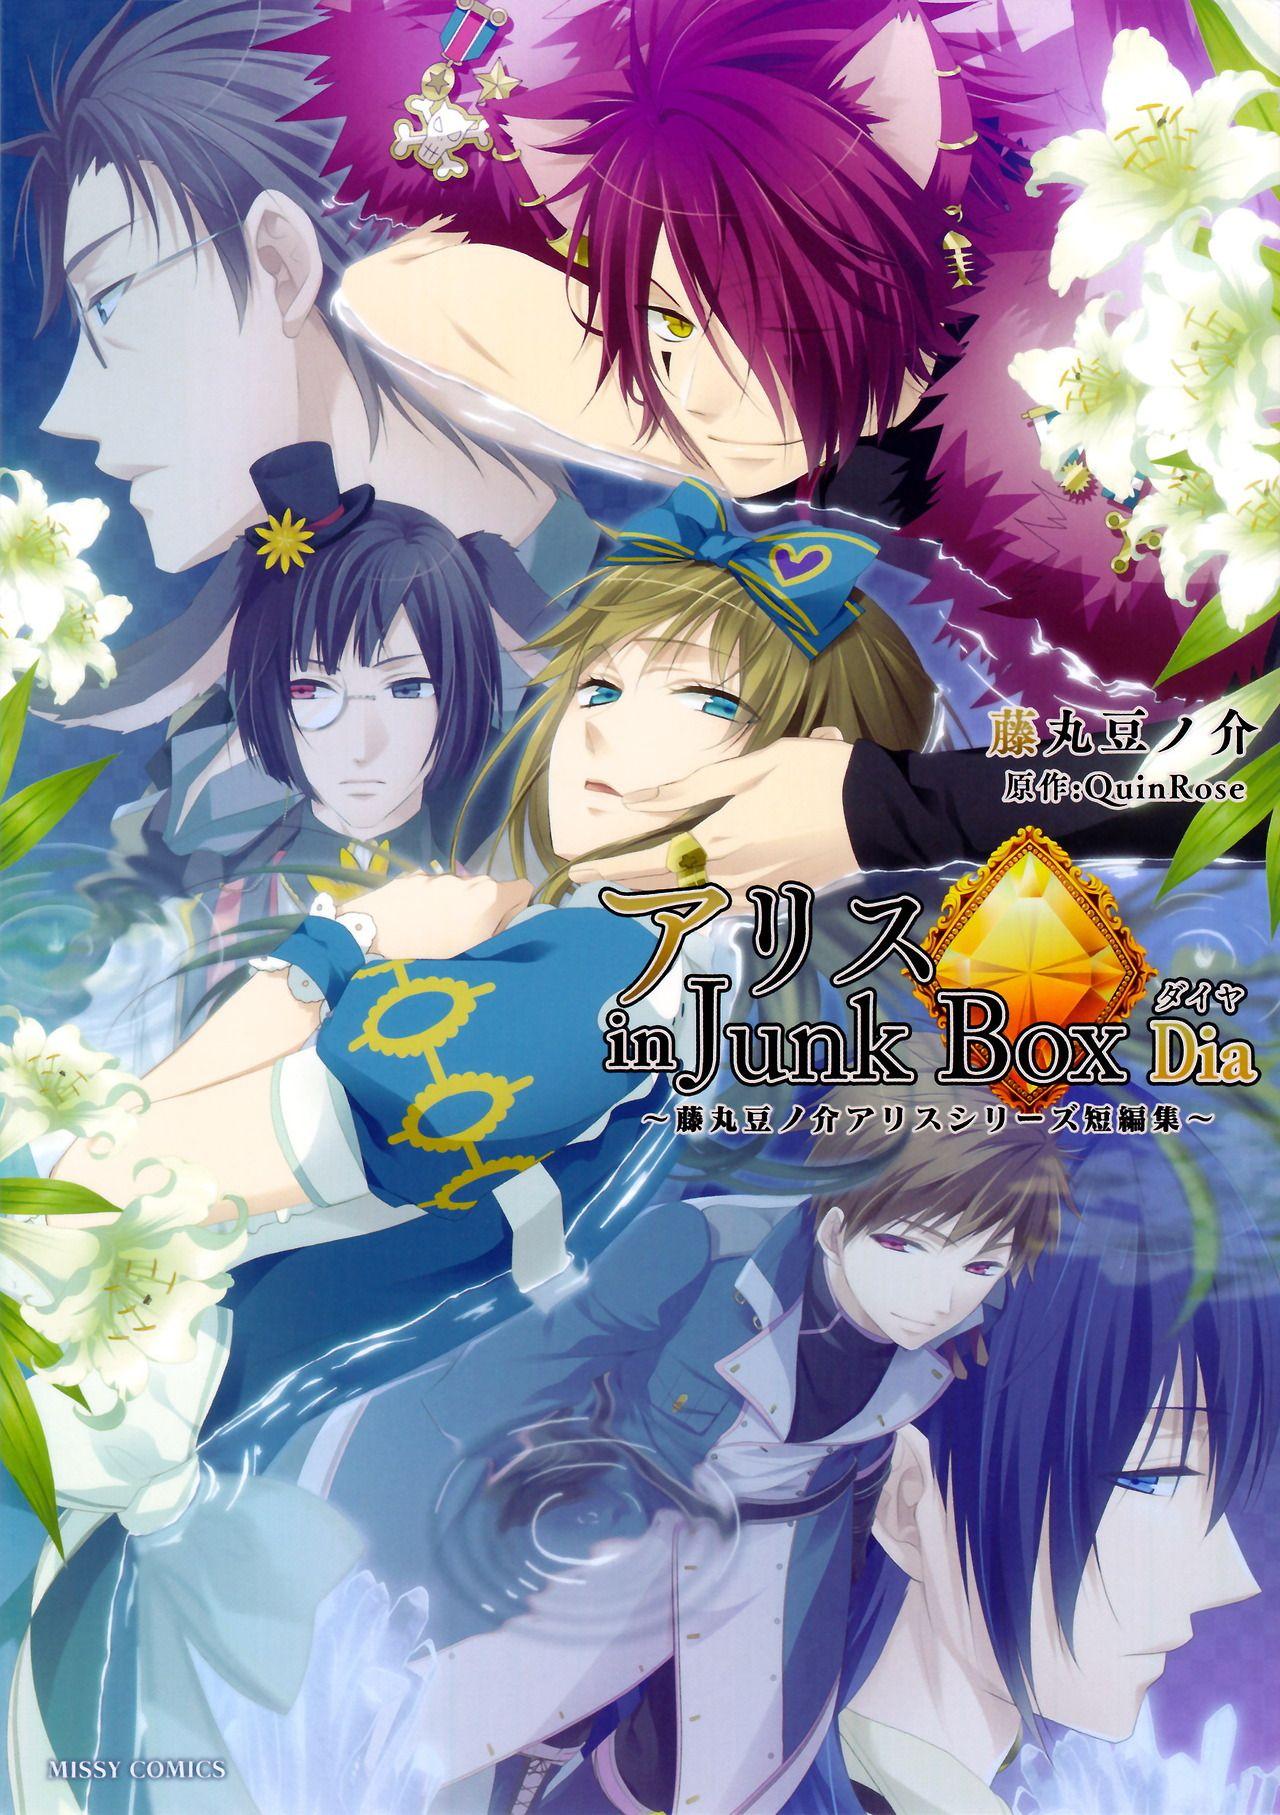 Diamond no kuni no Alice (With images) Alice anime